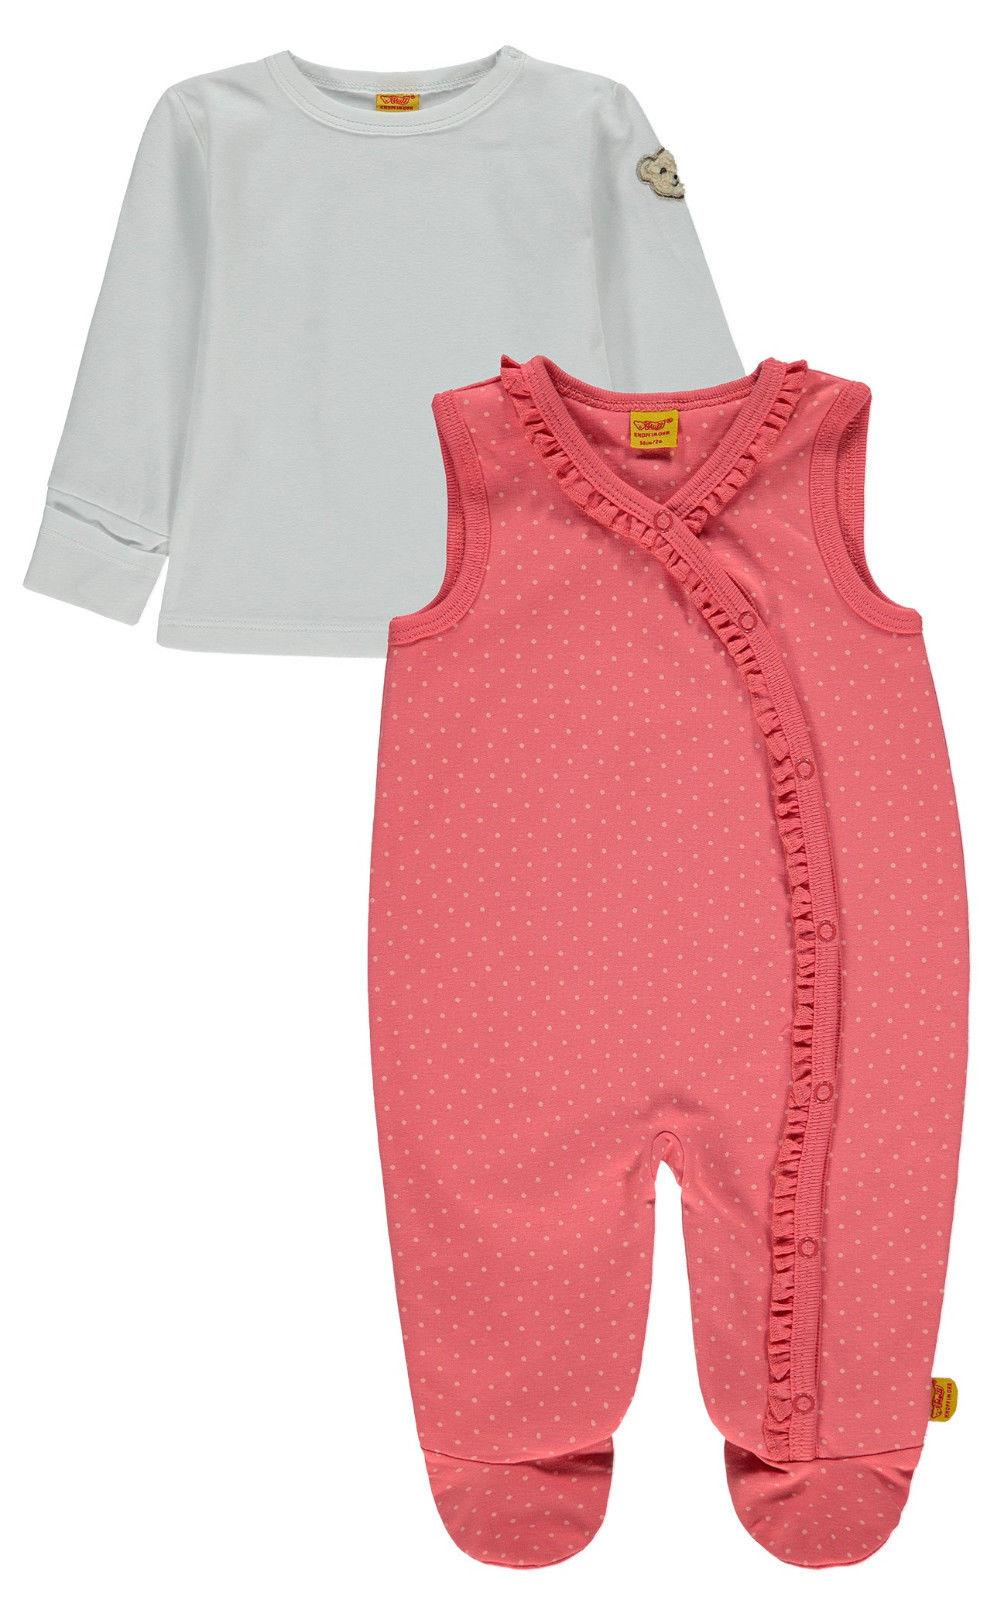 Clothing, Shoes & Accessories Steiff-strampler Gr 68 Baby Mädchen Girls' Clothing (newborn-5t)